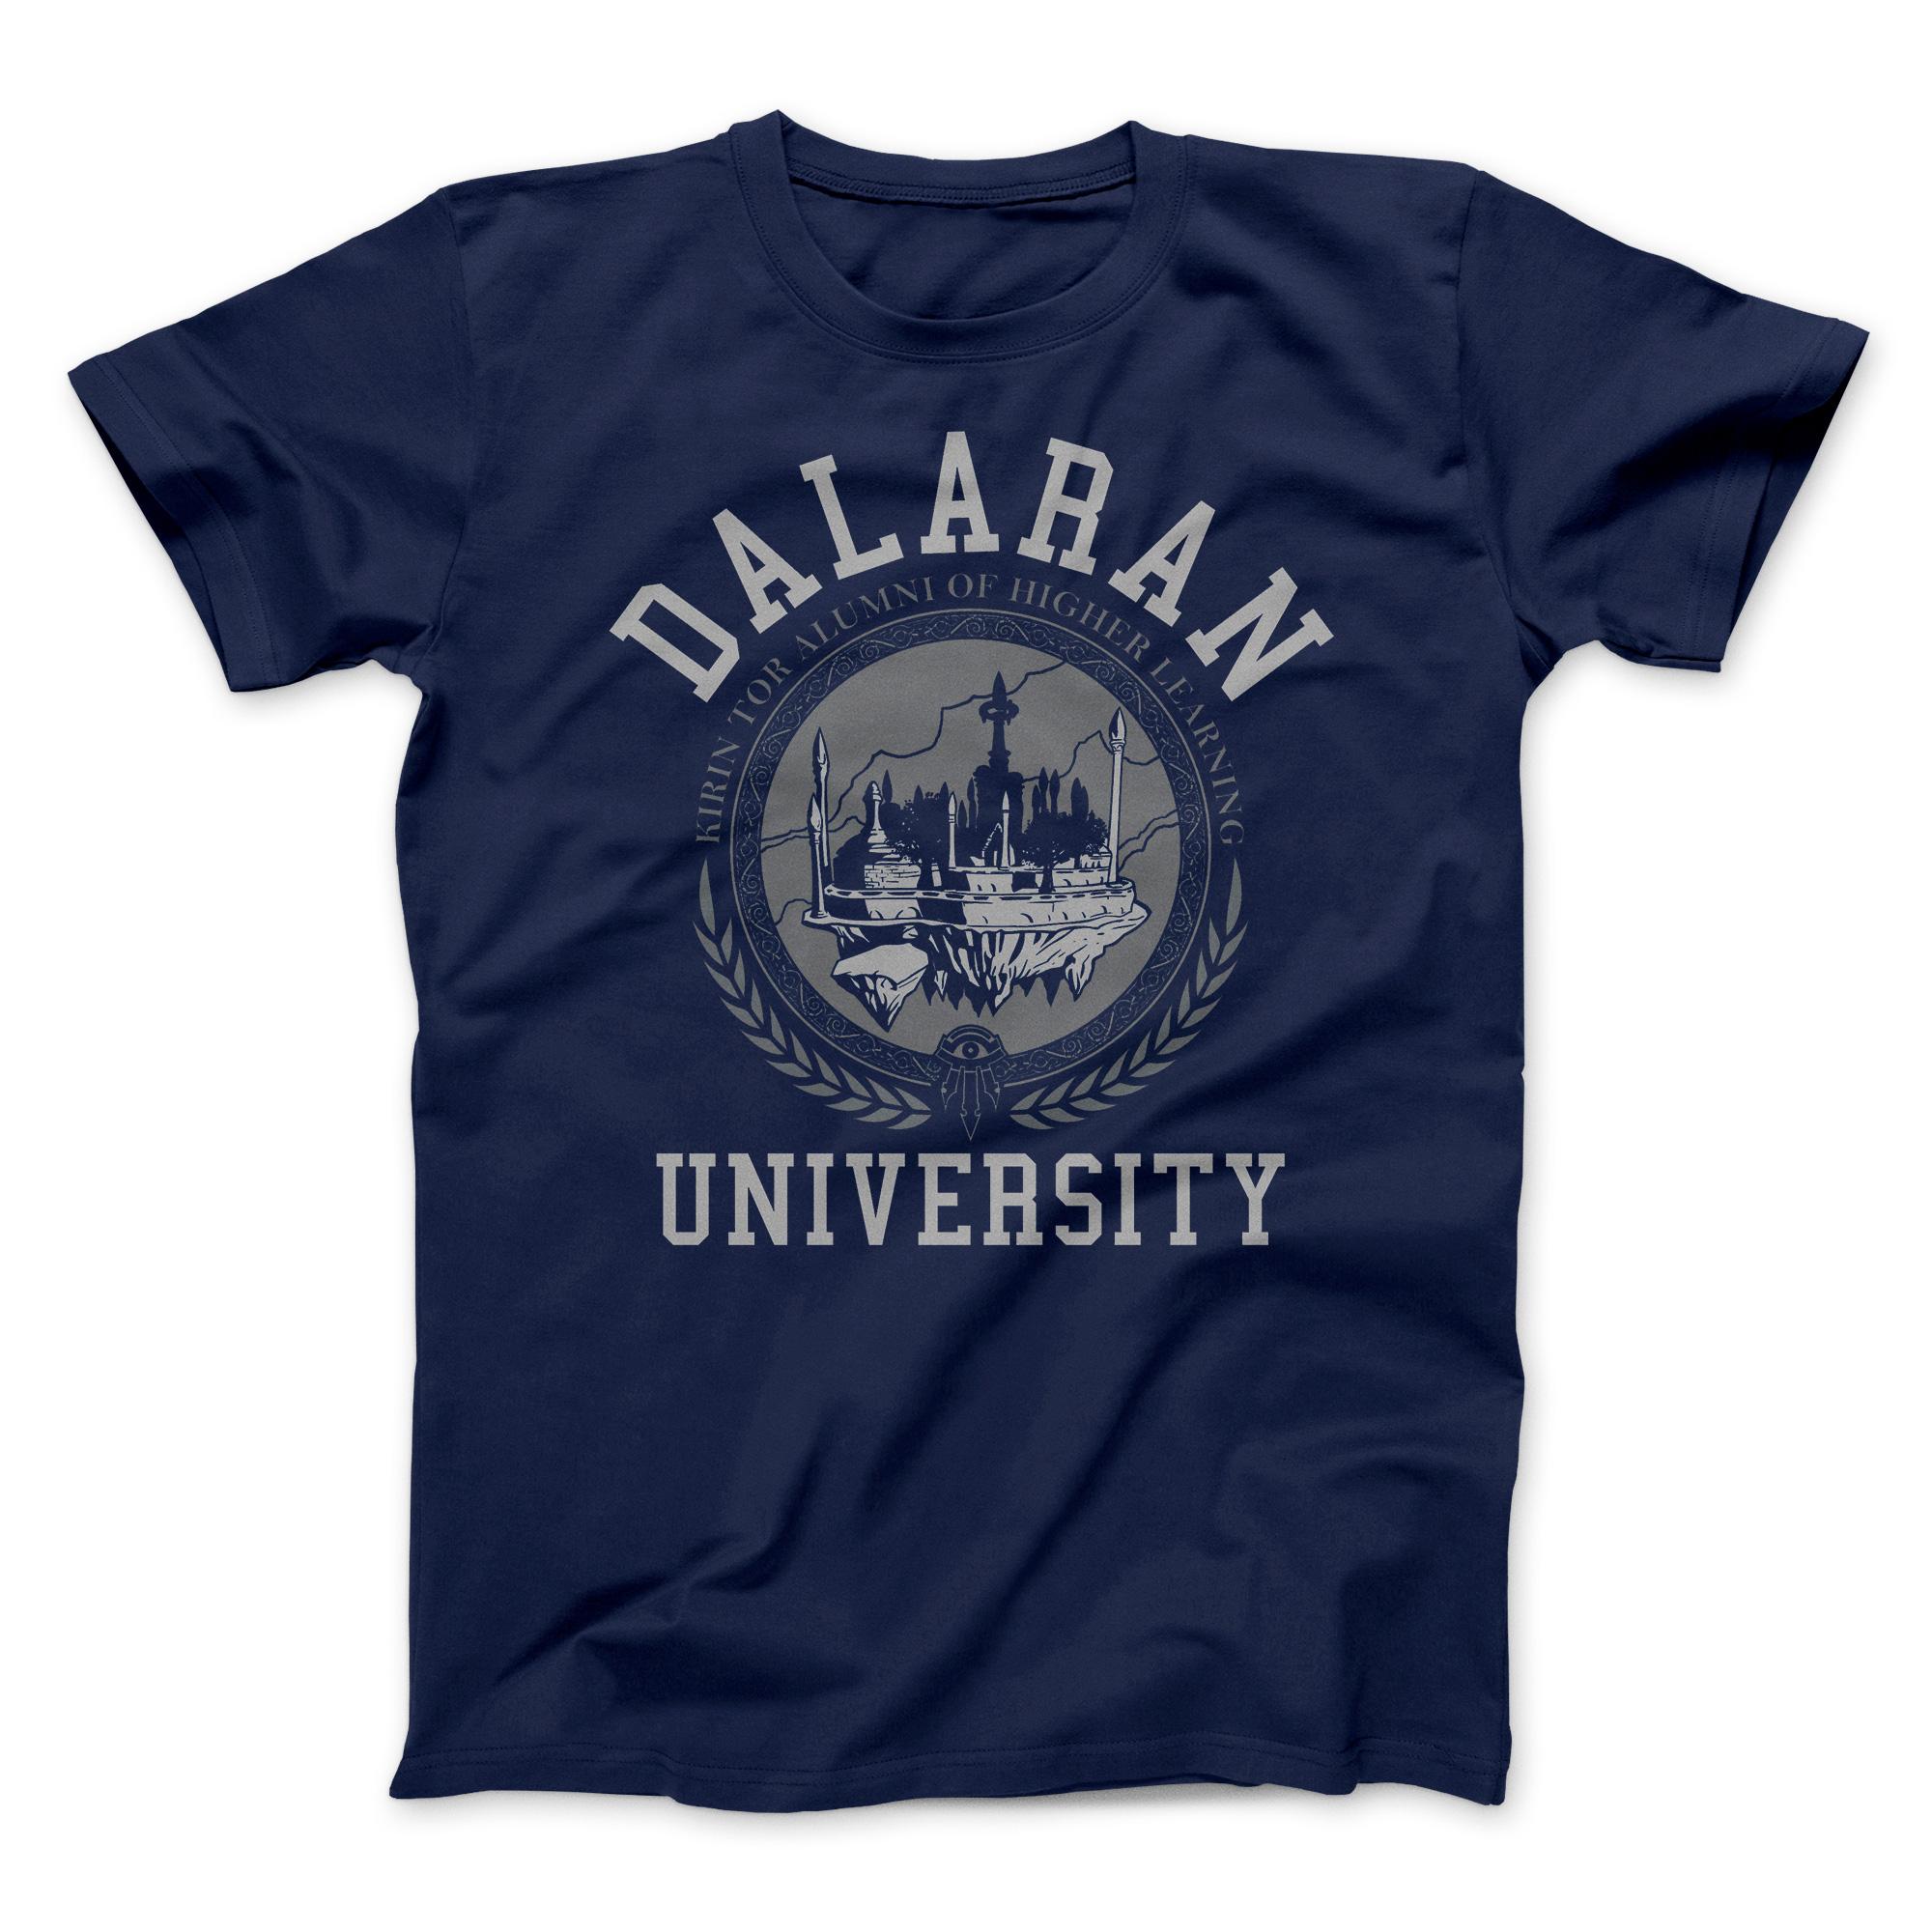 World of Warcraft - Dalaran University